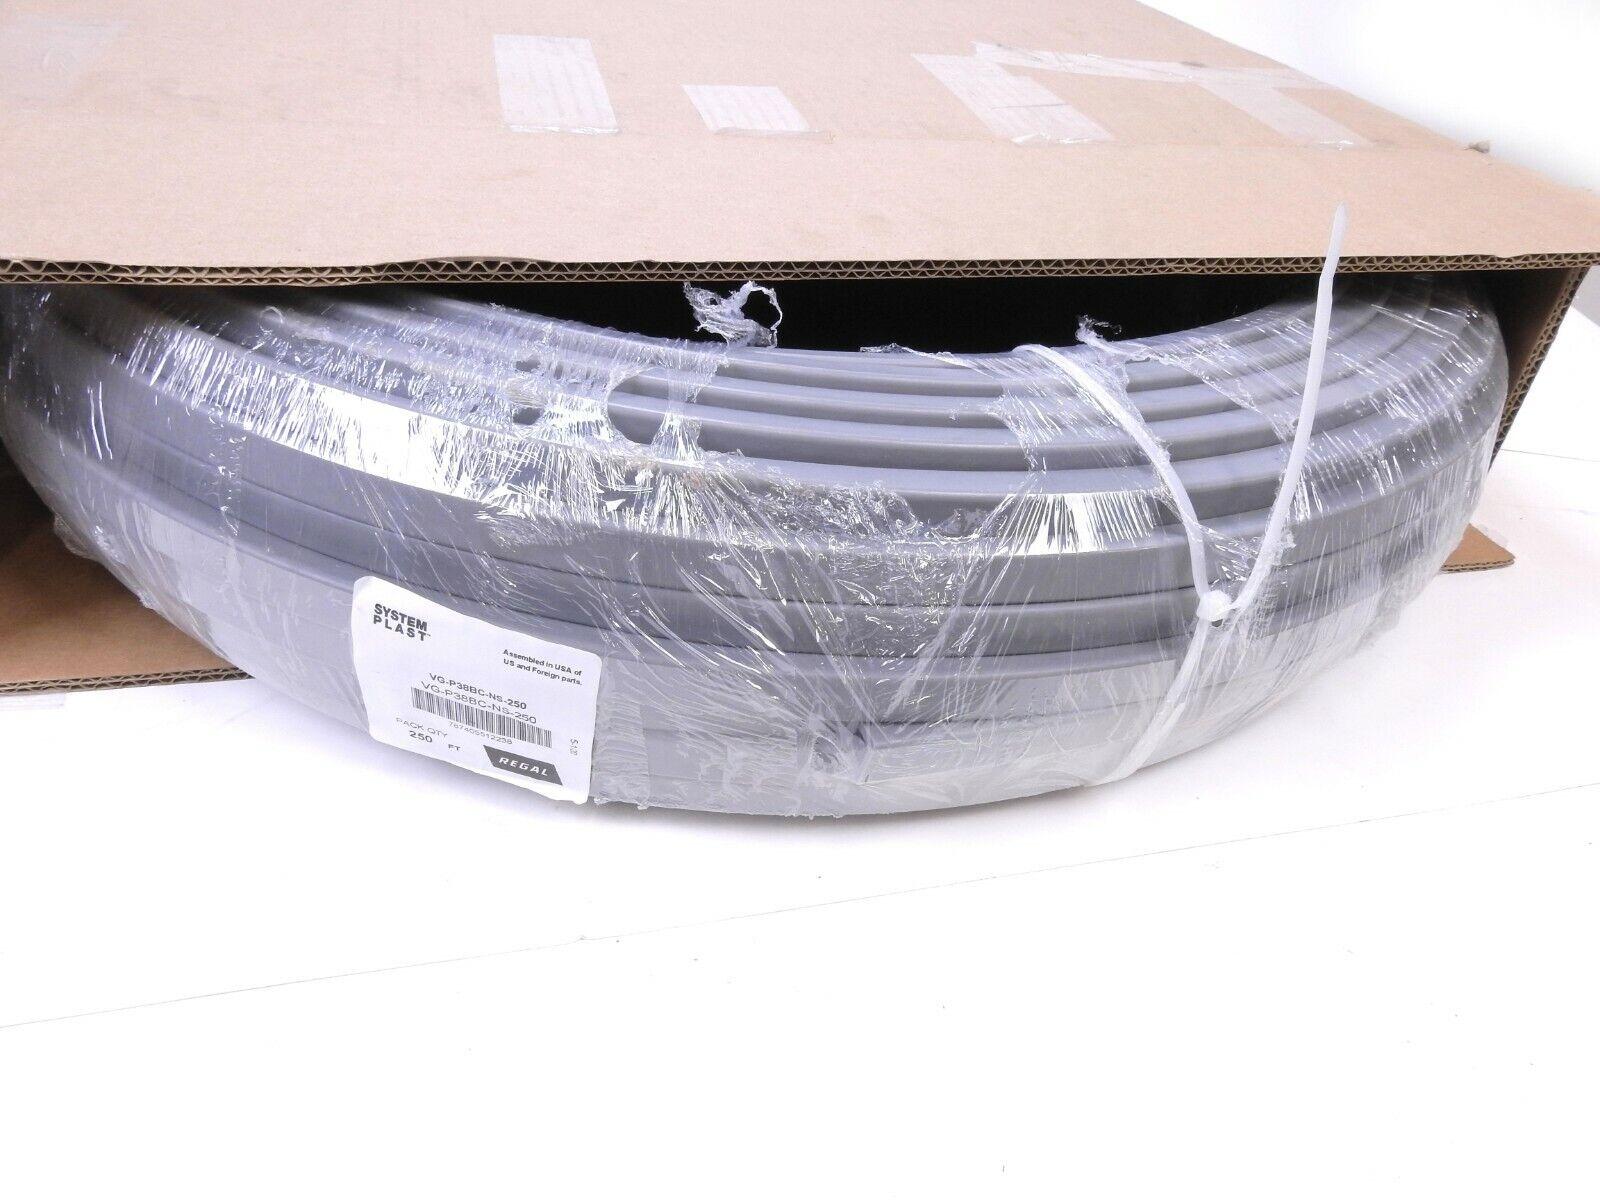 System Plast VG-P38BC-250